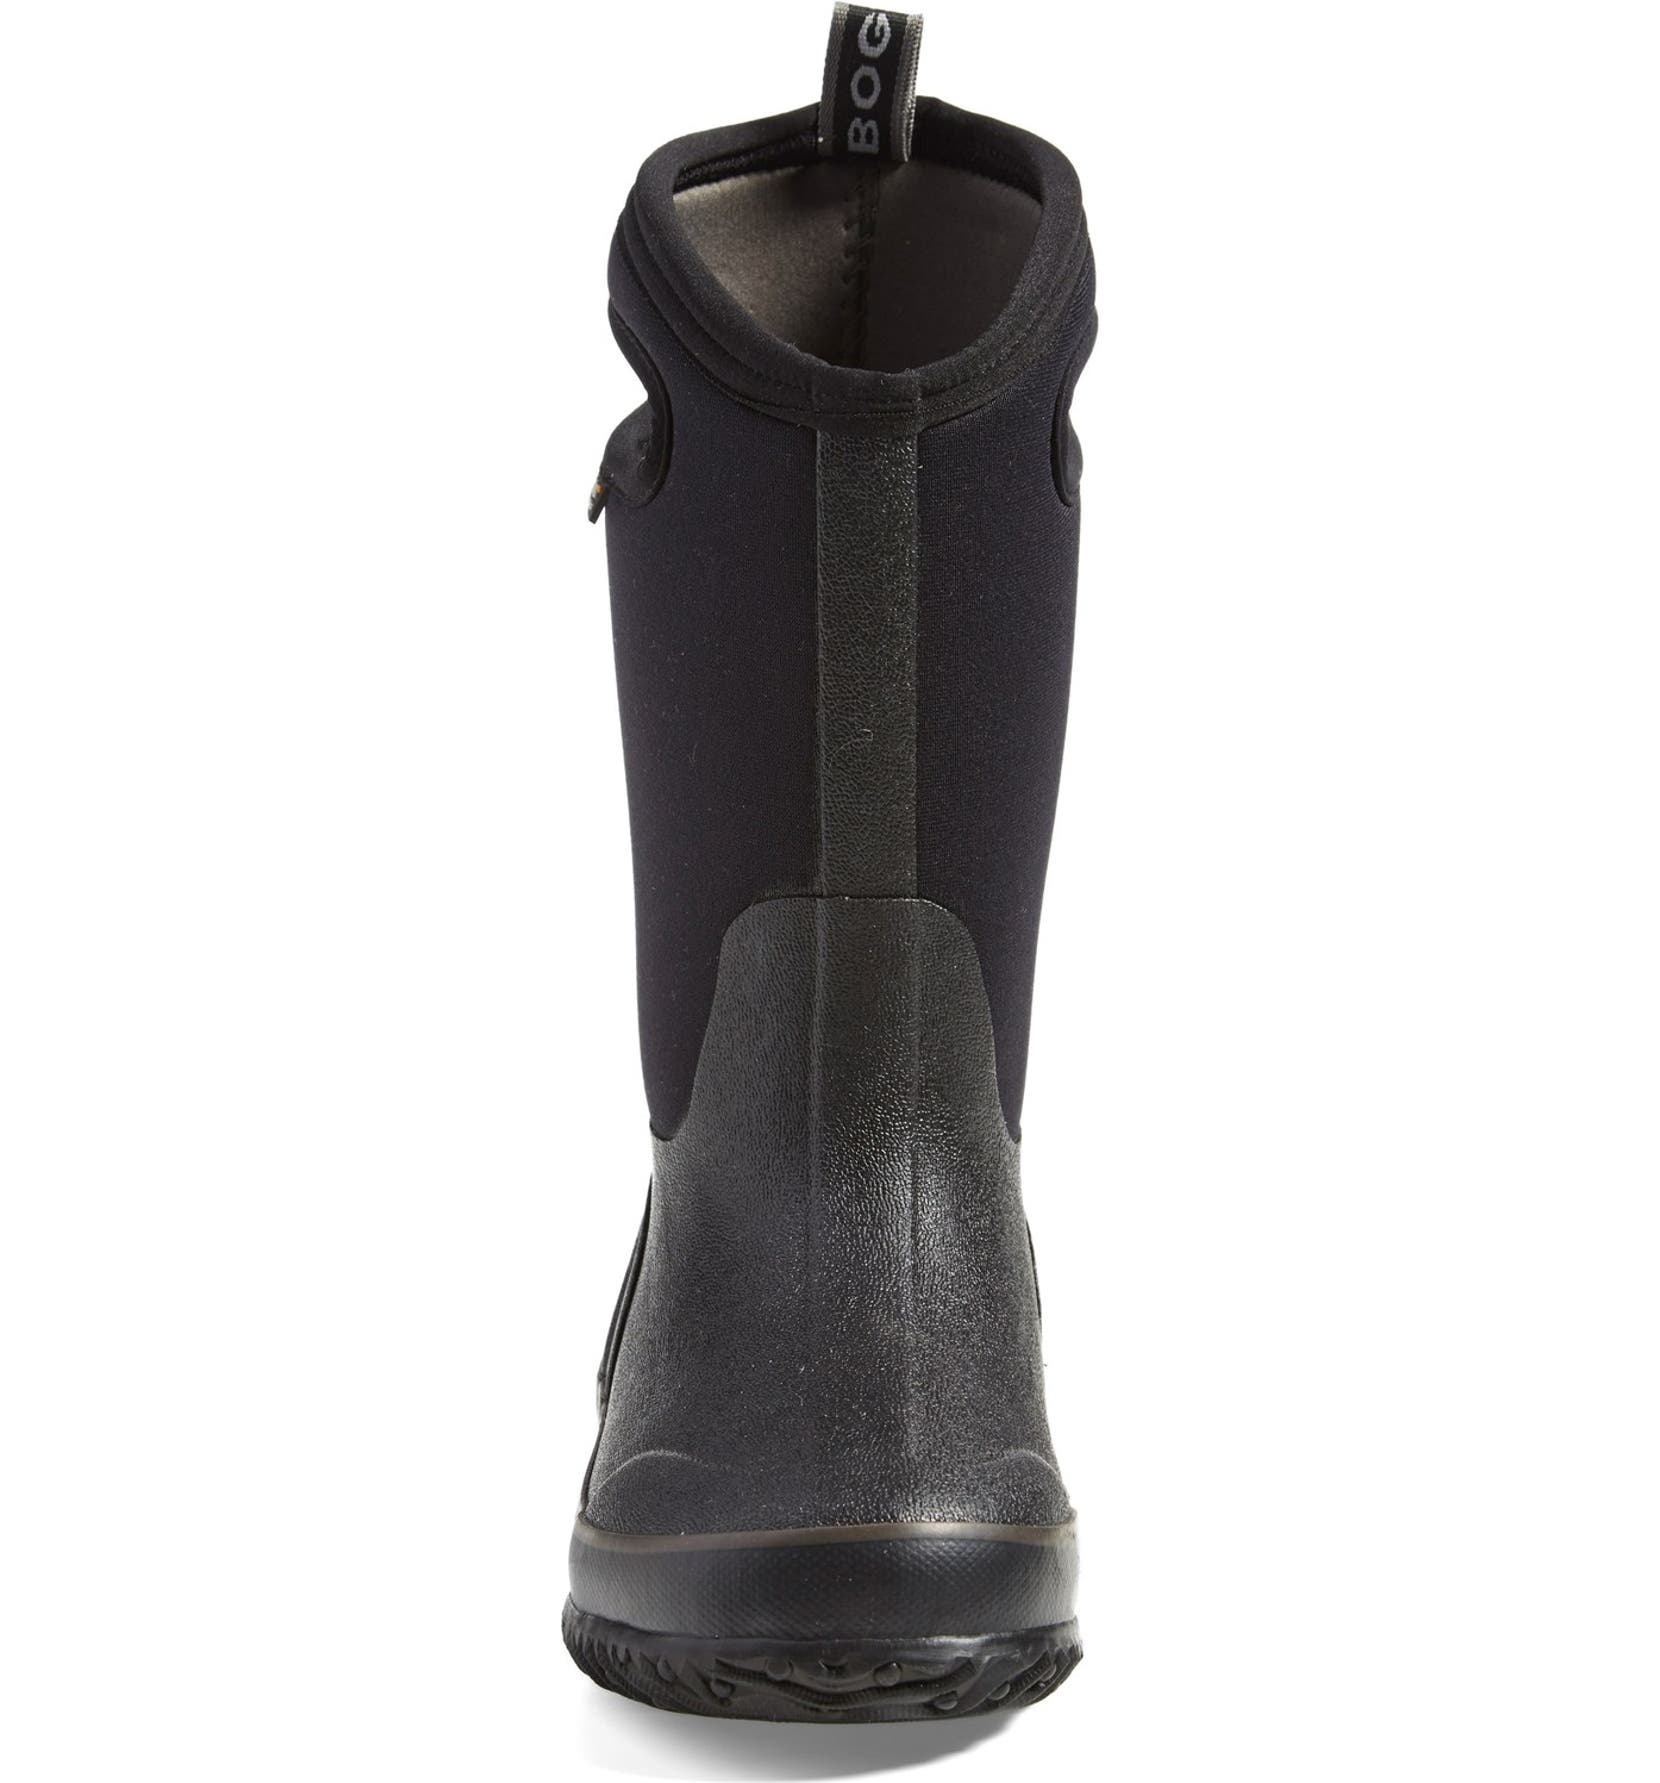 c7e867b4eff3 Bogs Classic High Waterproof Boot (Toddler